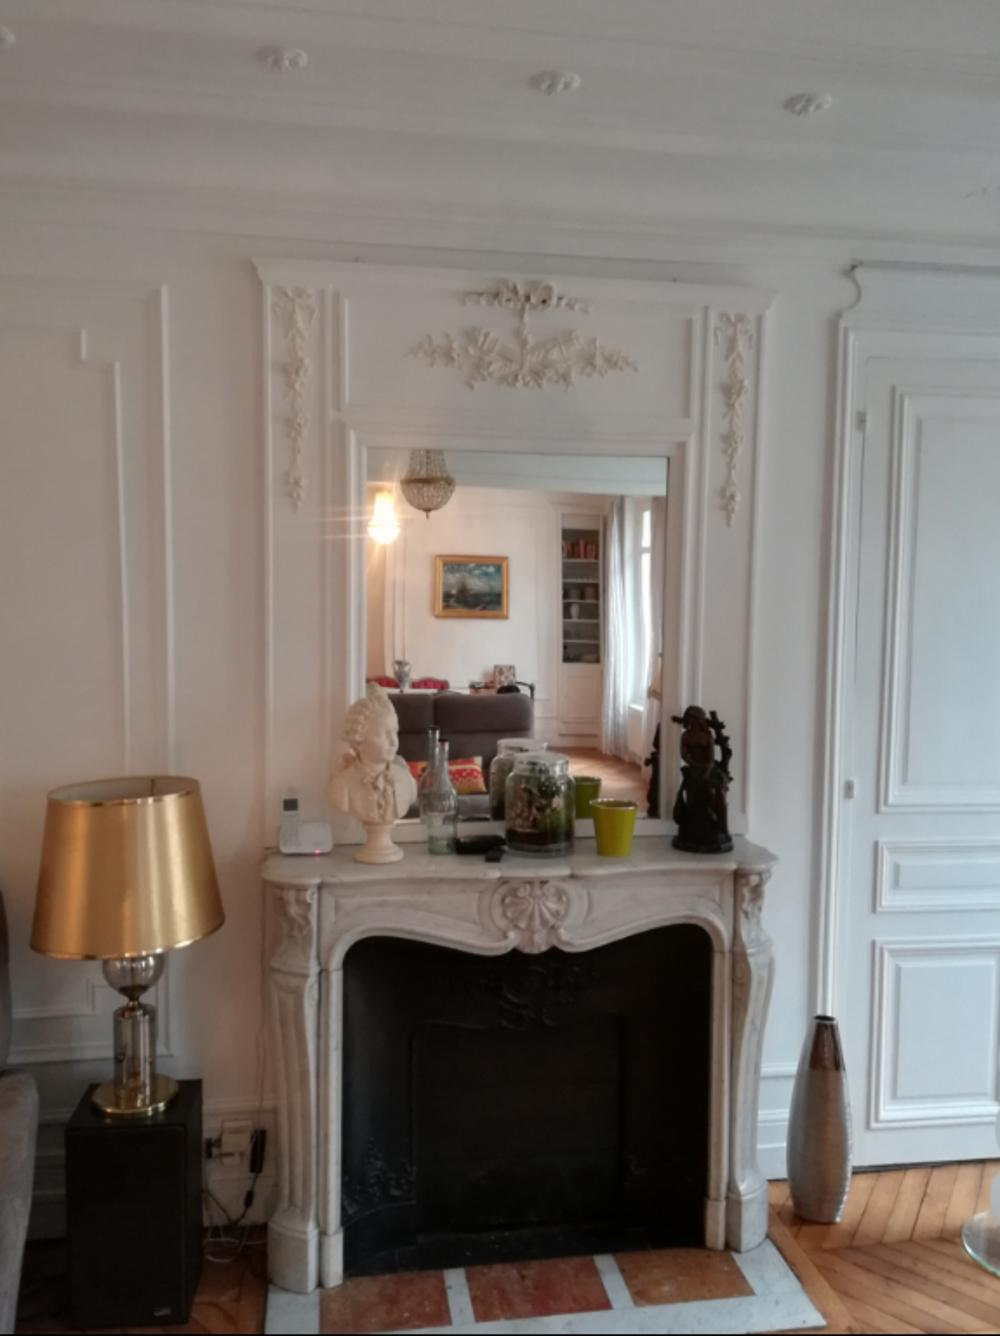 Paris 1er Arrondissement Paris (Seine) appartement photo 3448993